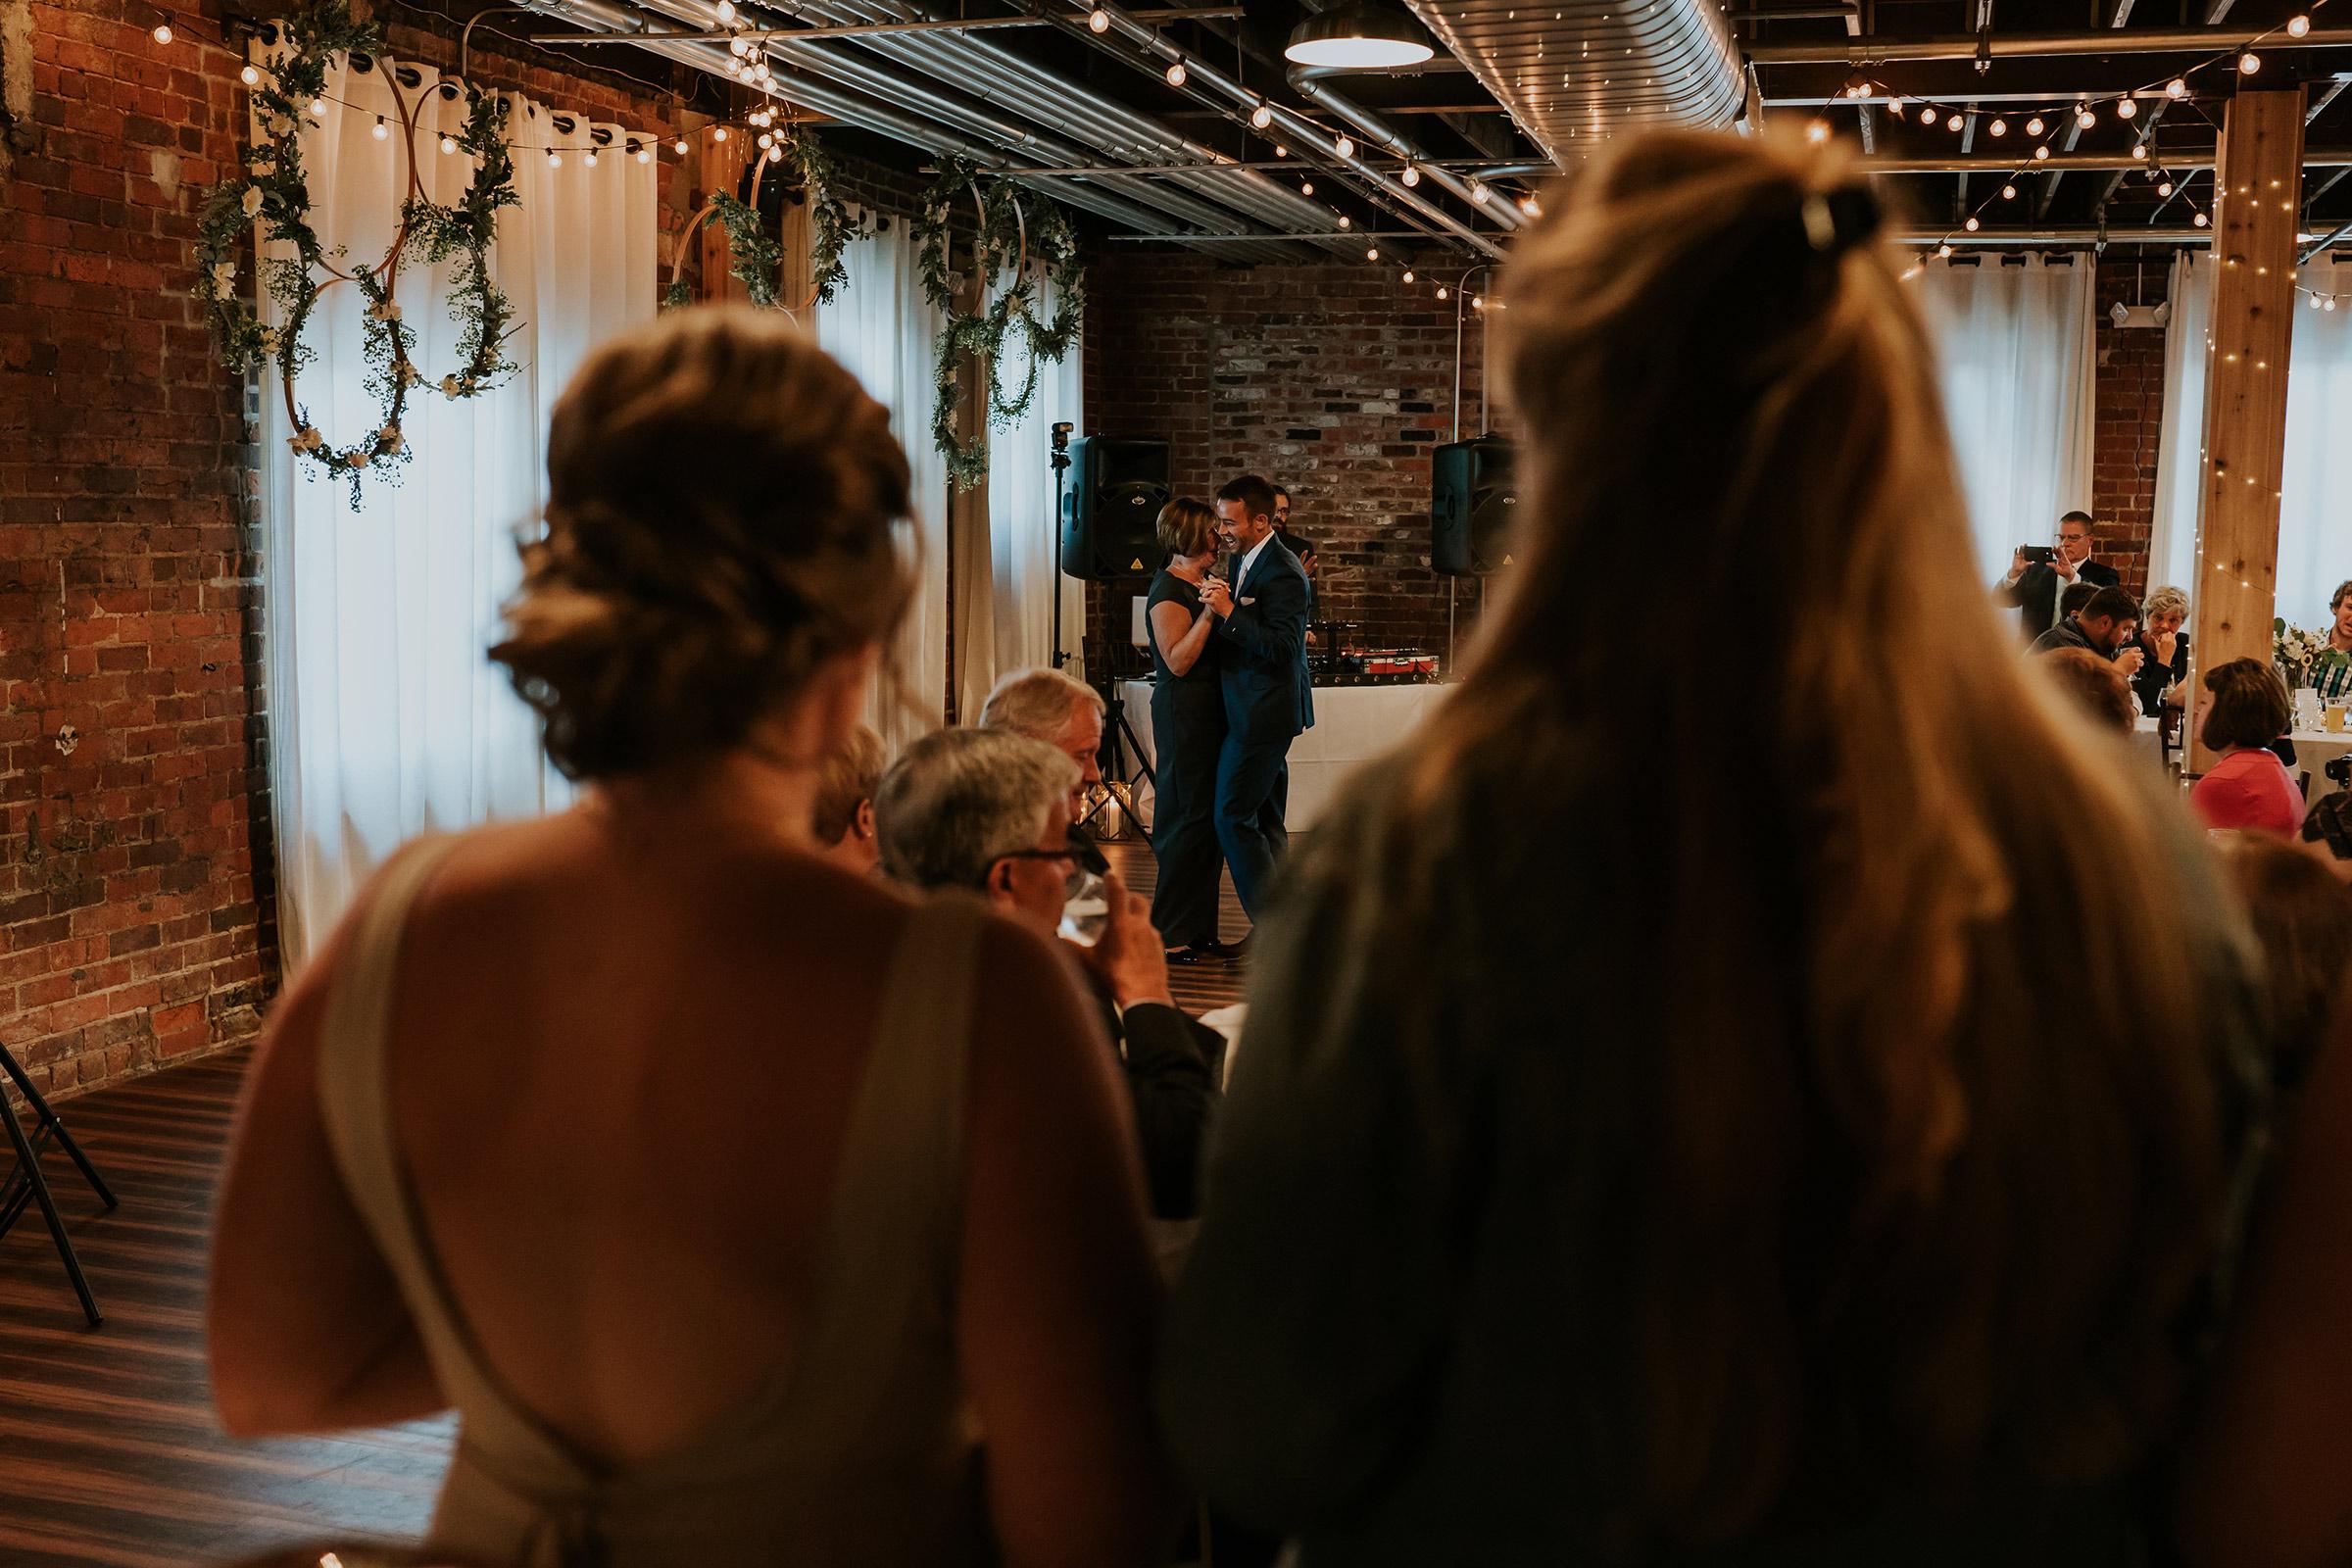 mr-mrs-hull-wedding-groom-mother-dance-guest-watching-iowa-taproom-desmoines-iowa-raelyn-ramey-photography-609.jpg